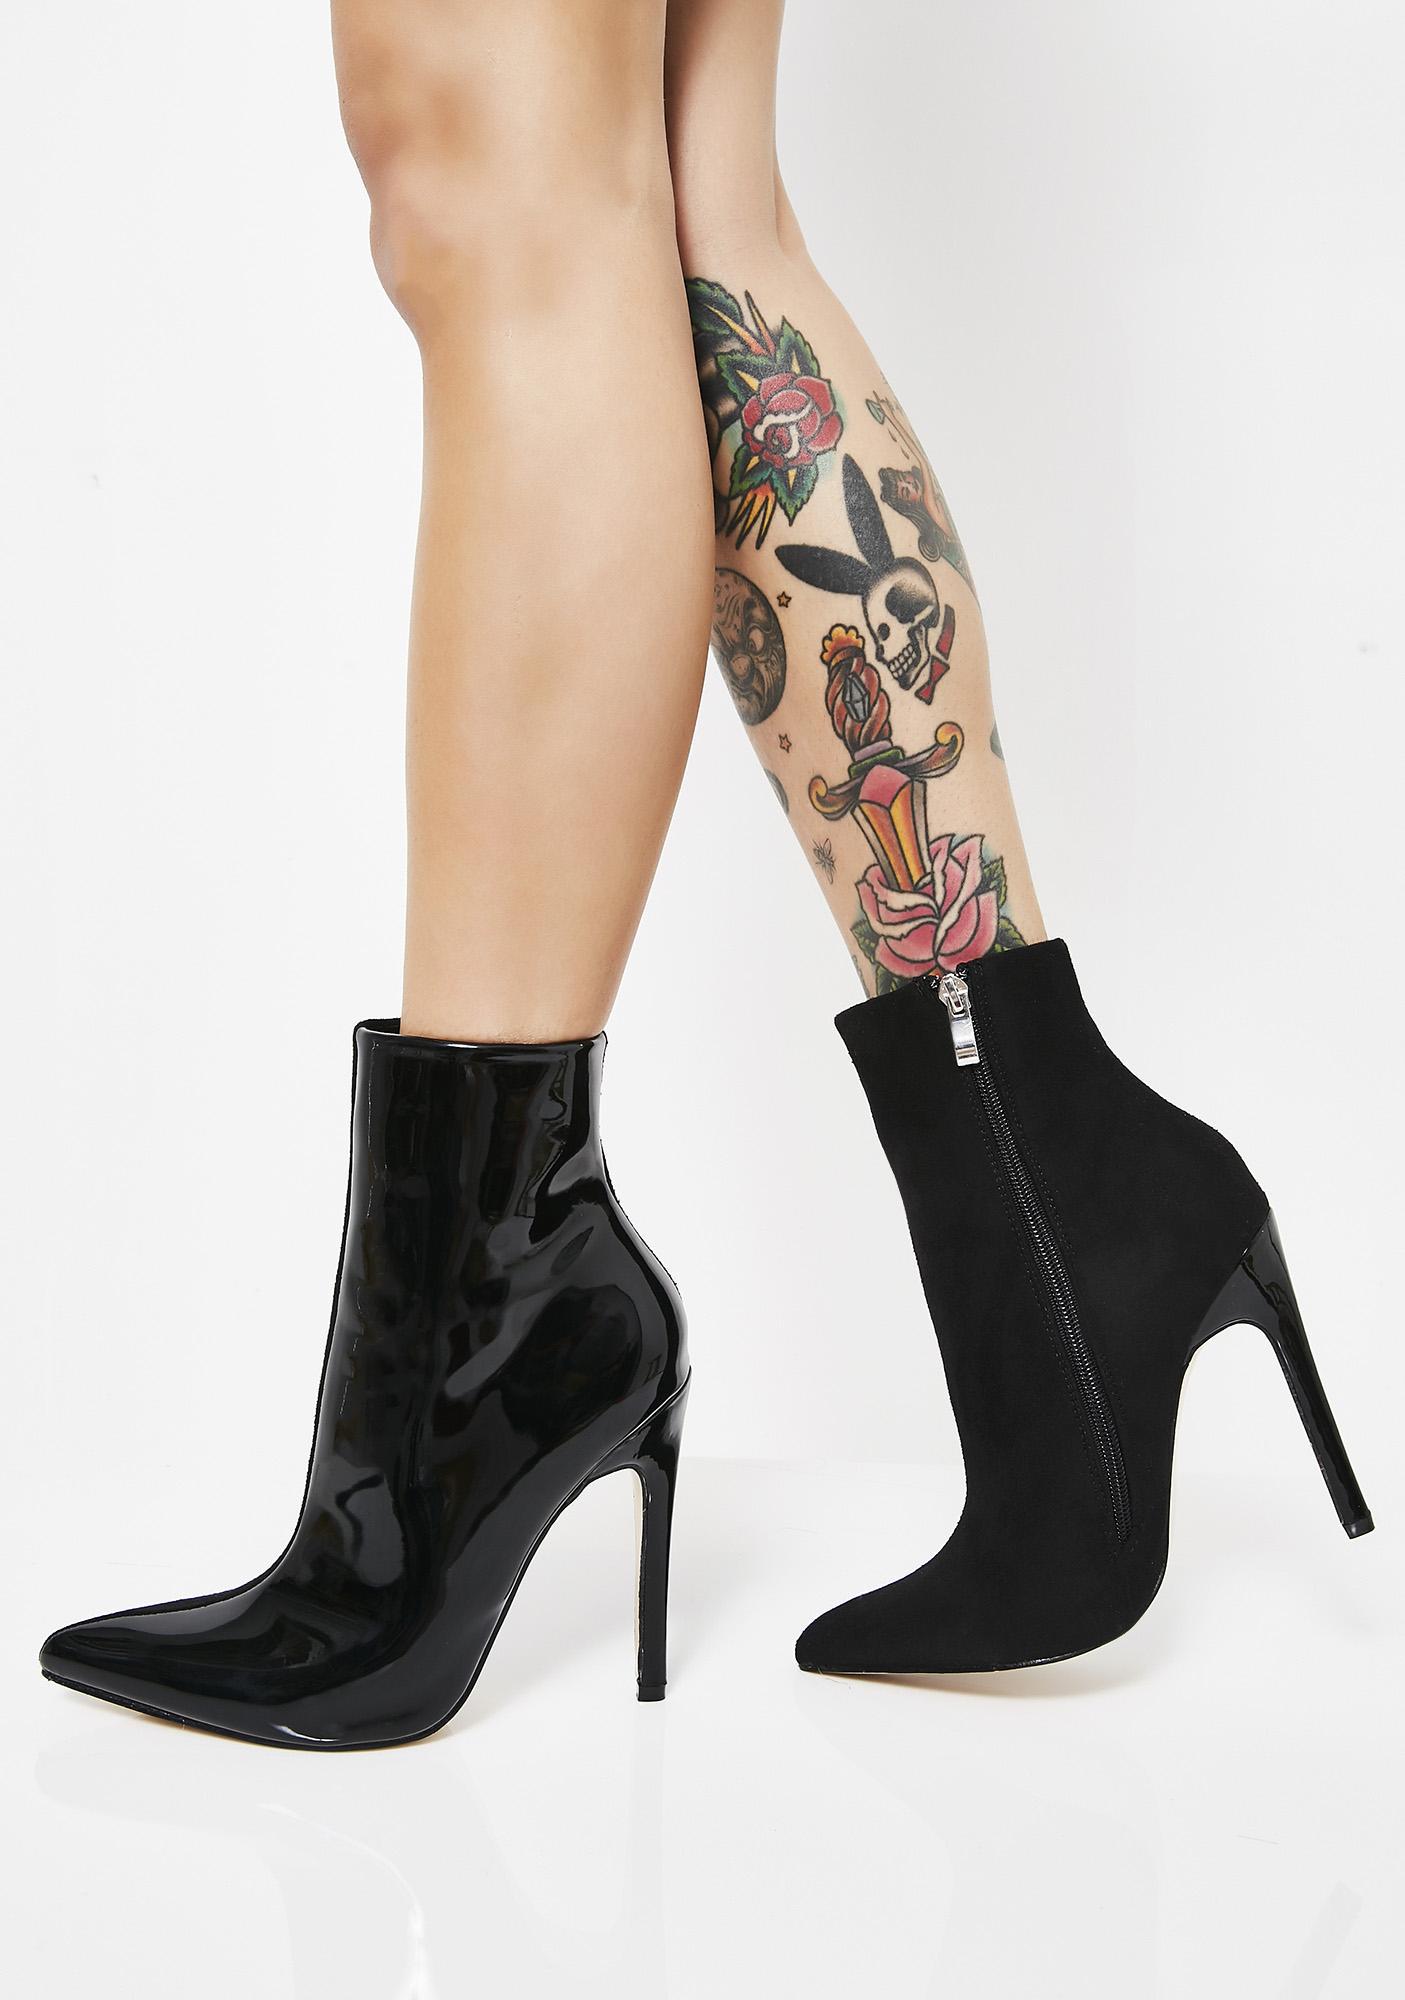 55650a388a8 ... Public Desire Yuri Contrast Stiletto Heel Ankle Boots ...